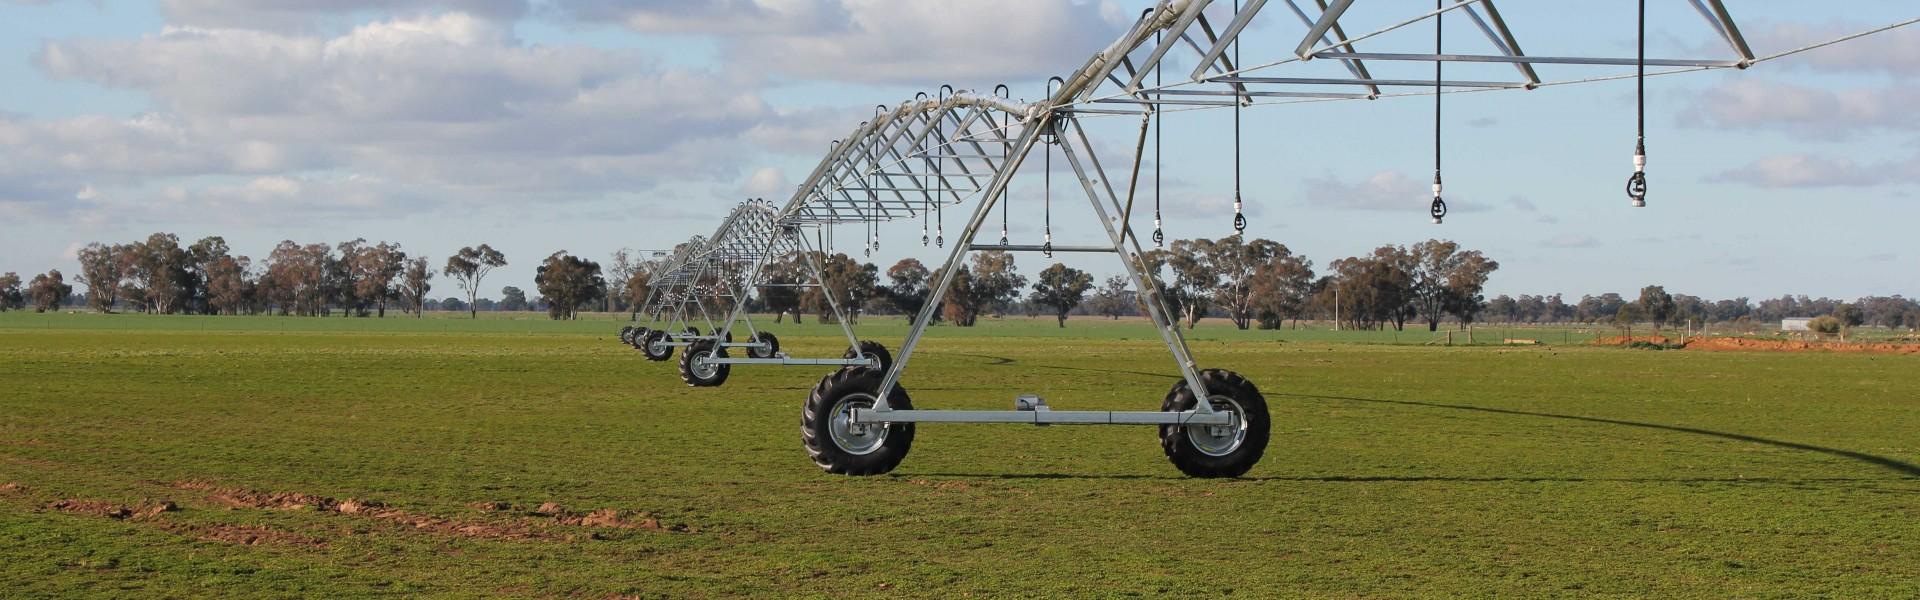 Australia's Premier Pivot Irrigation Manufacturer